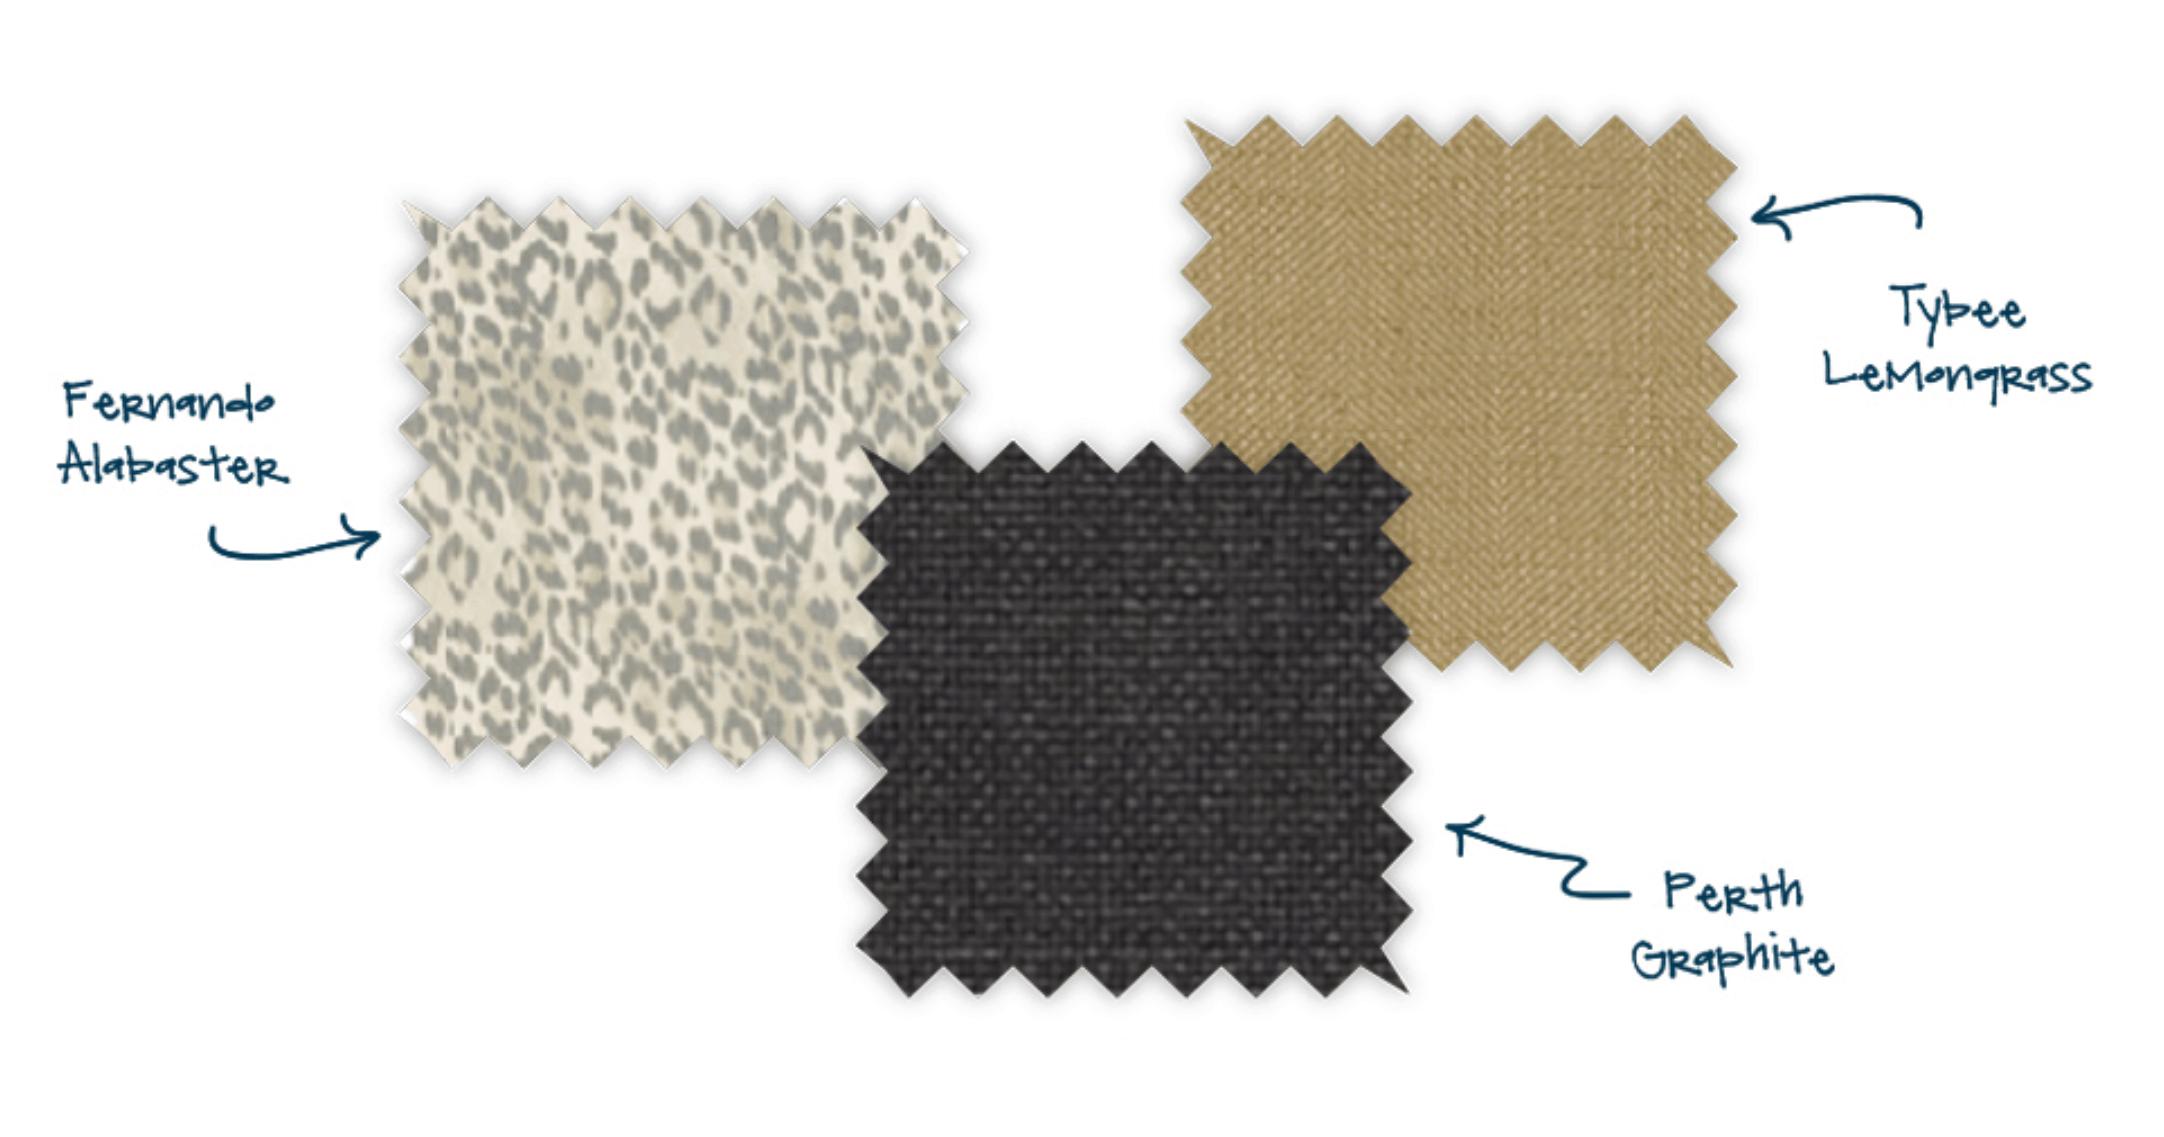 fabric swatches, fernando alabaster, tybee lemongrass, perth graphite